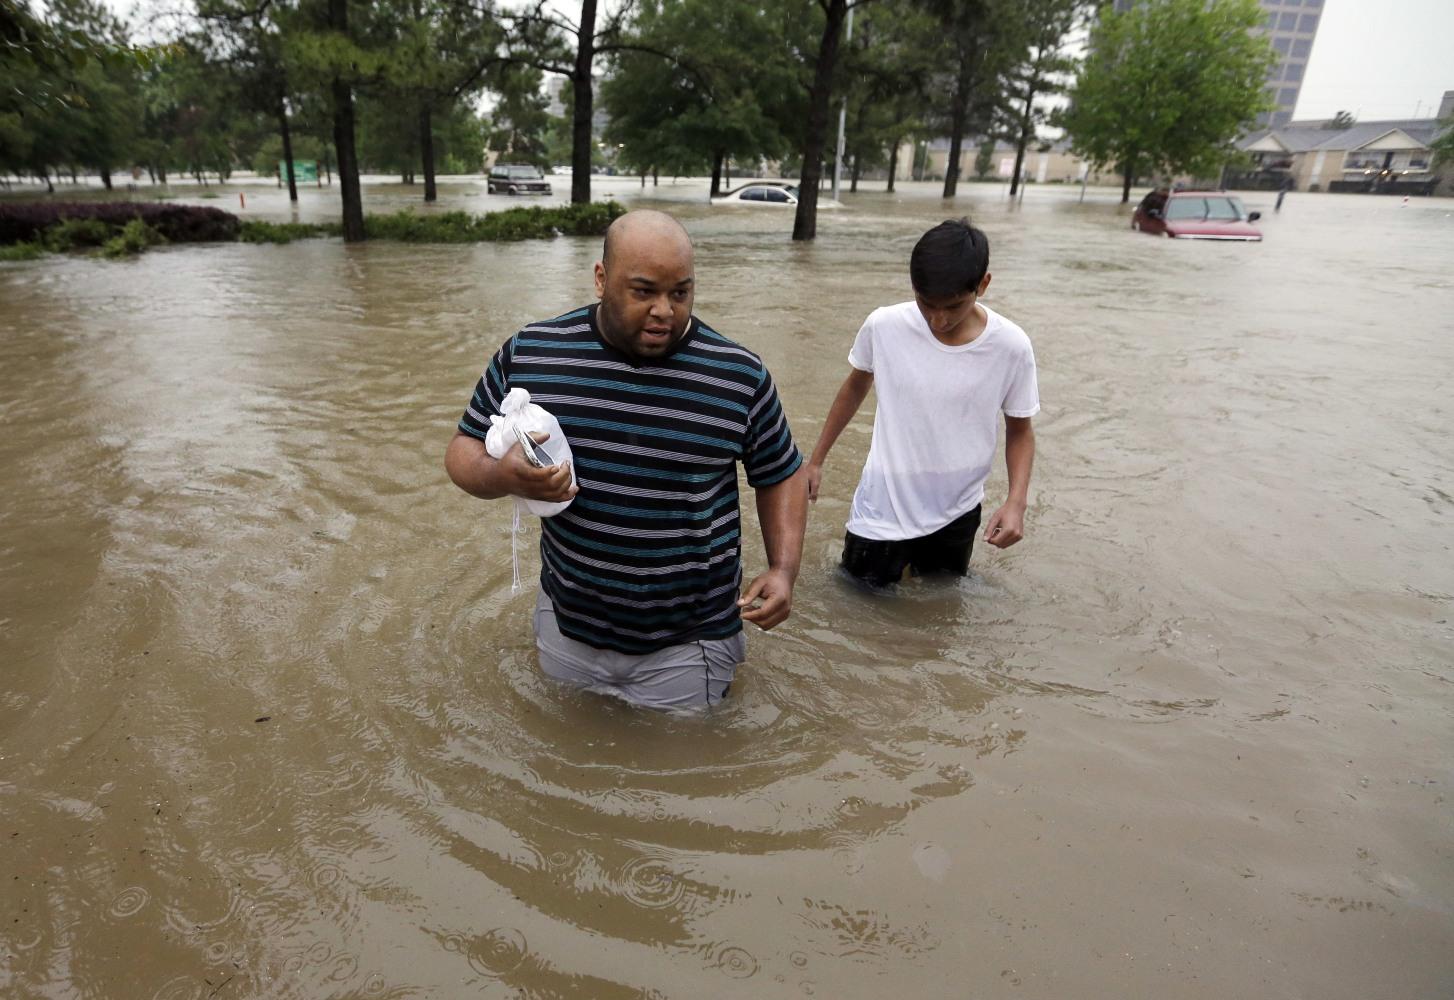 September 29-30, 2012: Heavy Rainfall & Flash Flooding in East Texas